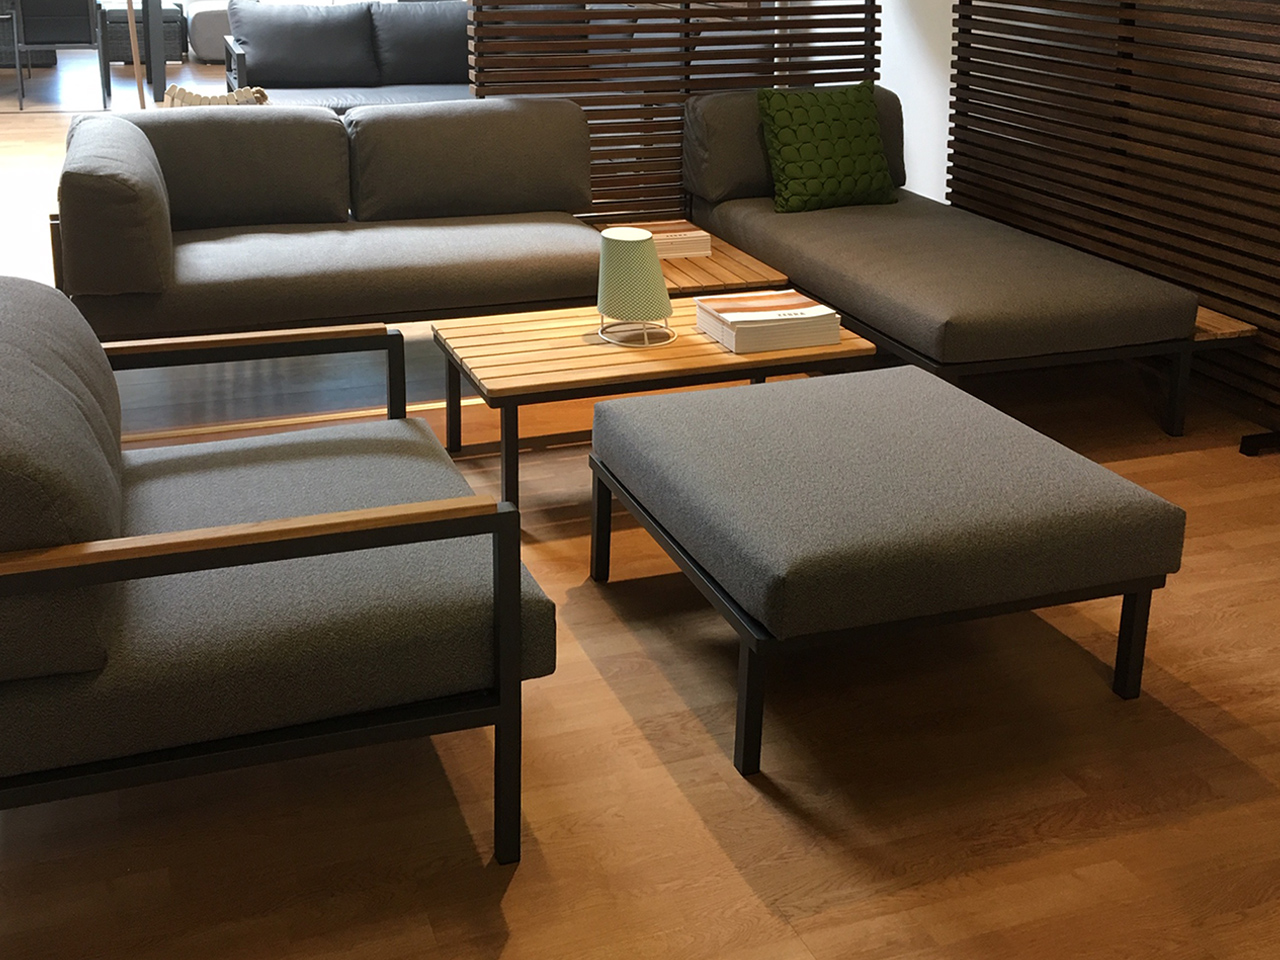 Hudson Lounge - Salons de jardin / Zebra :: Anthamatten ...